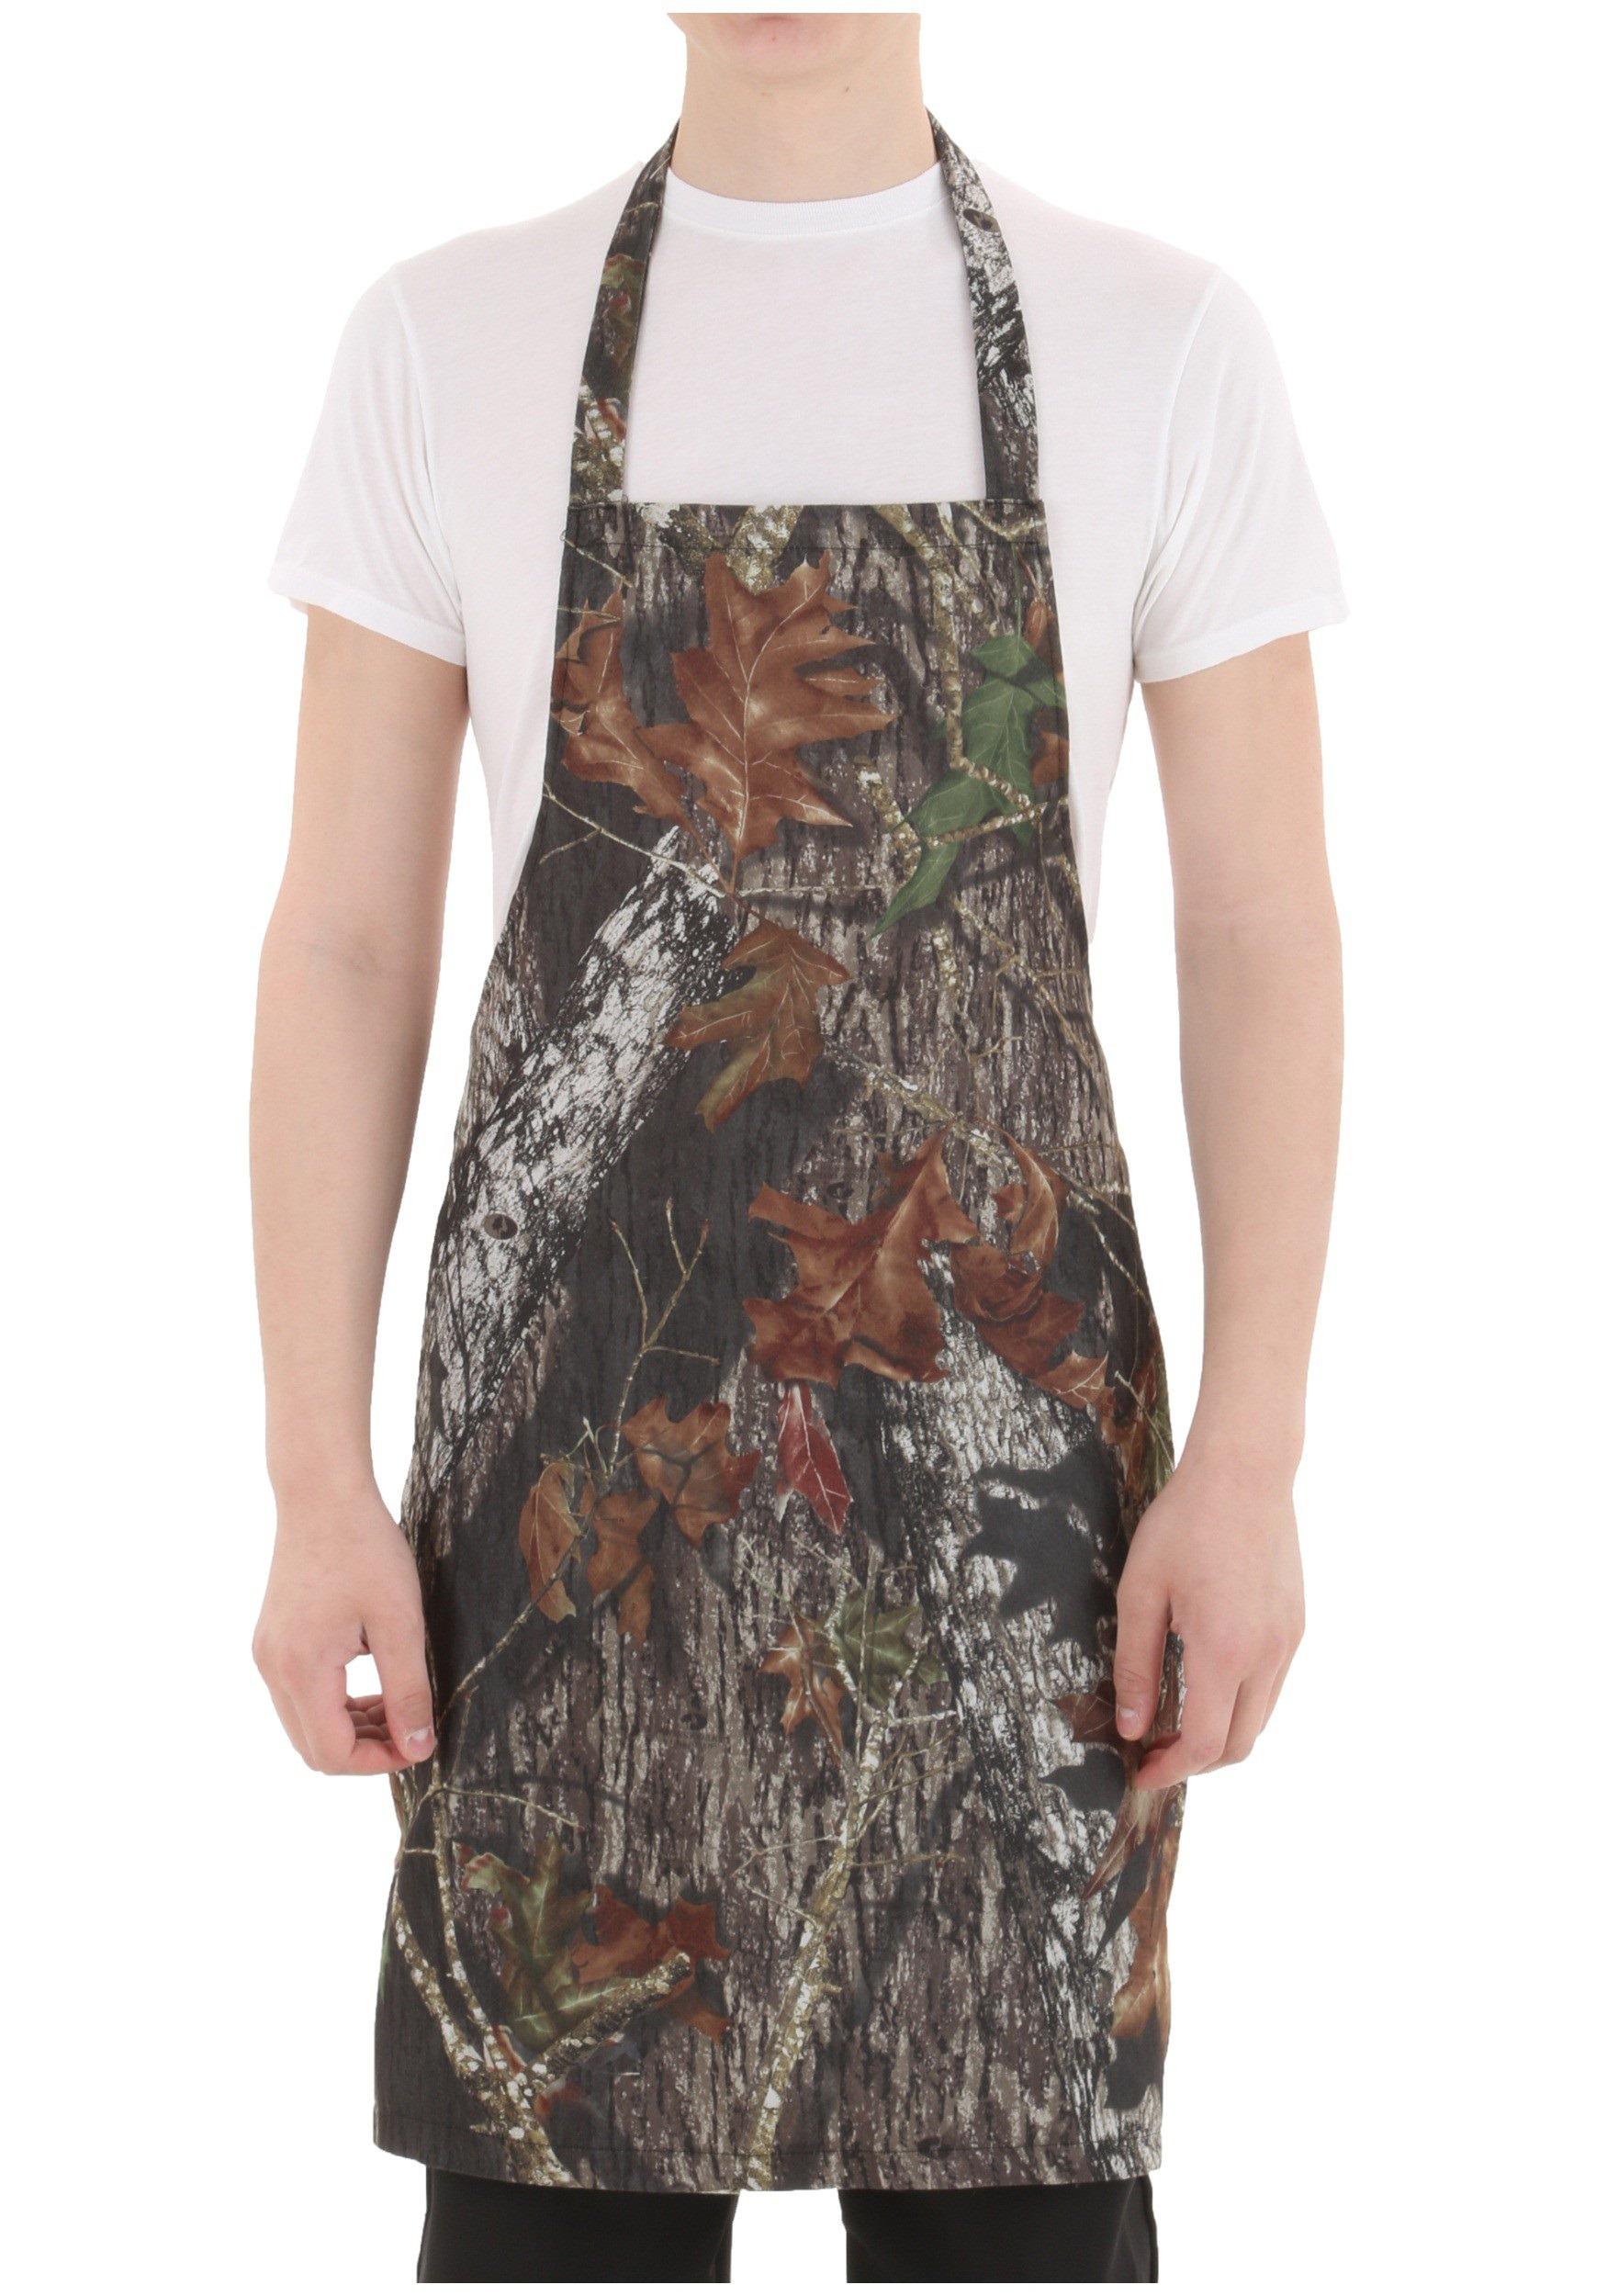 Mossy Oak Camouflage Apron